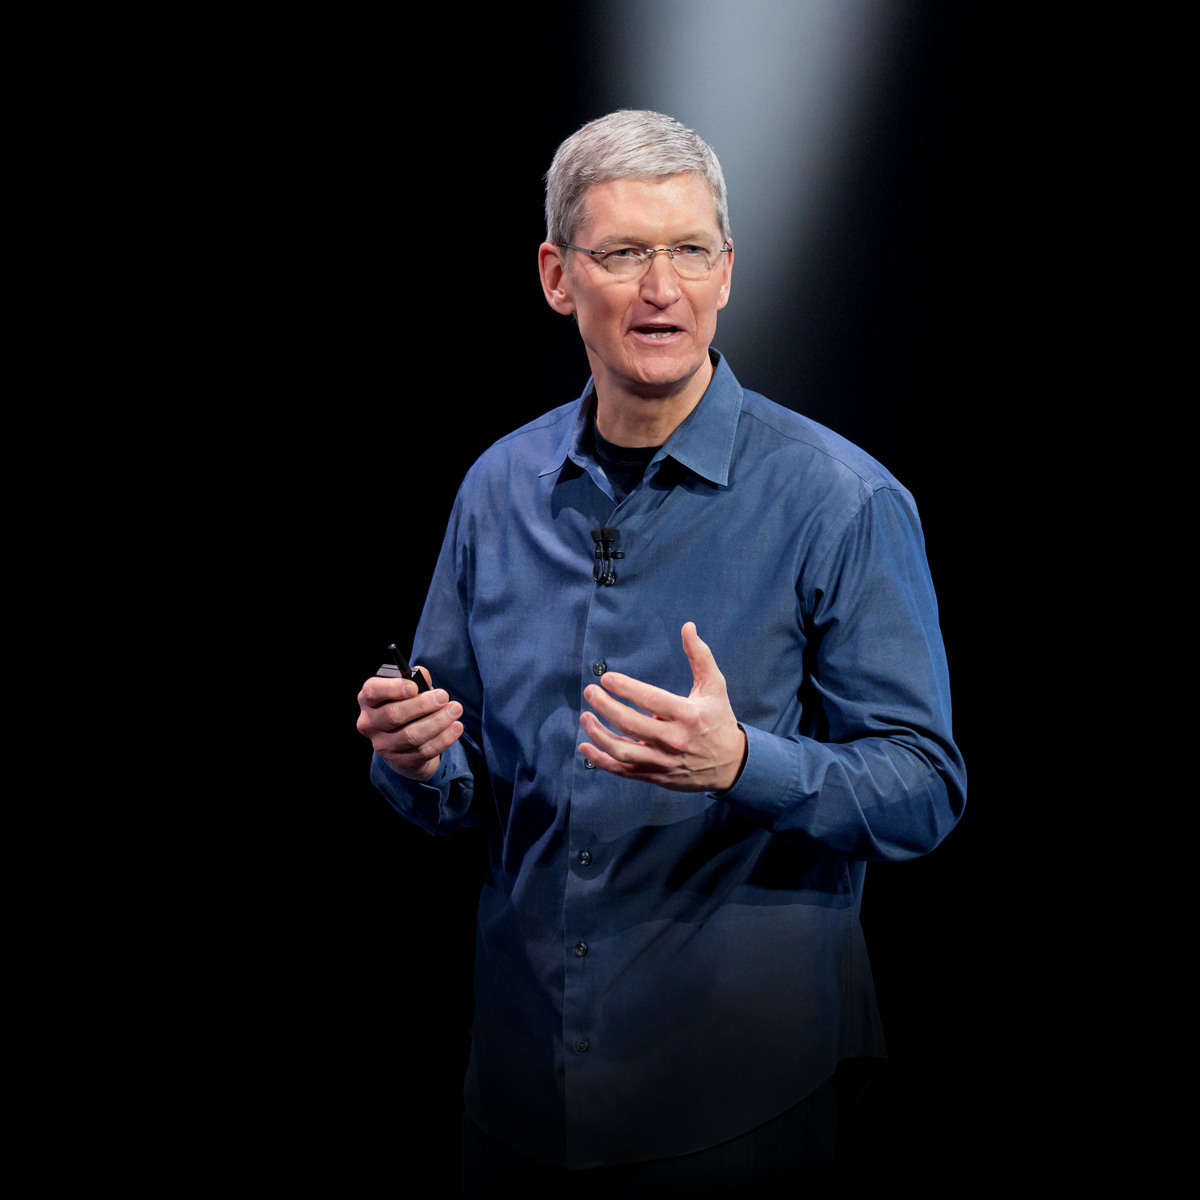 Tim Cook em keynote da Apple